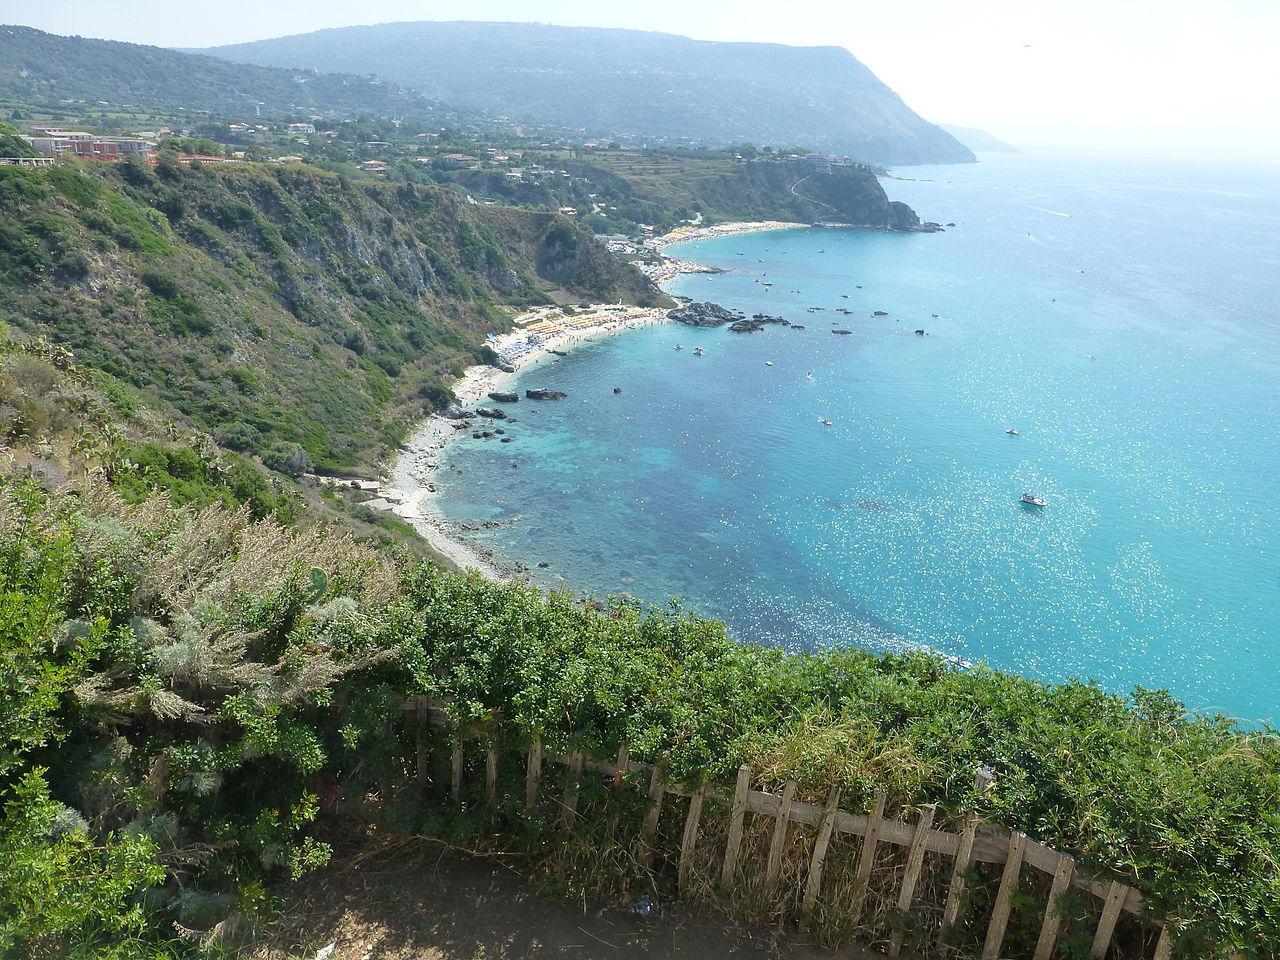 Grotticelle Beach, Calabria, Best Italy Beaches